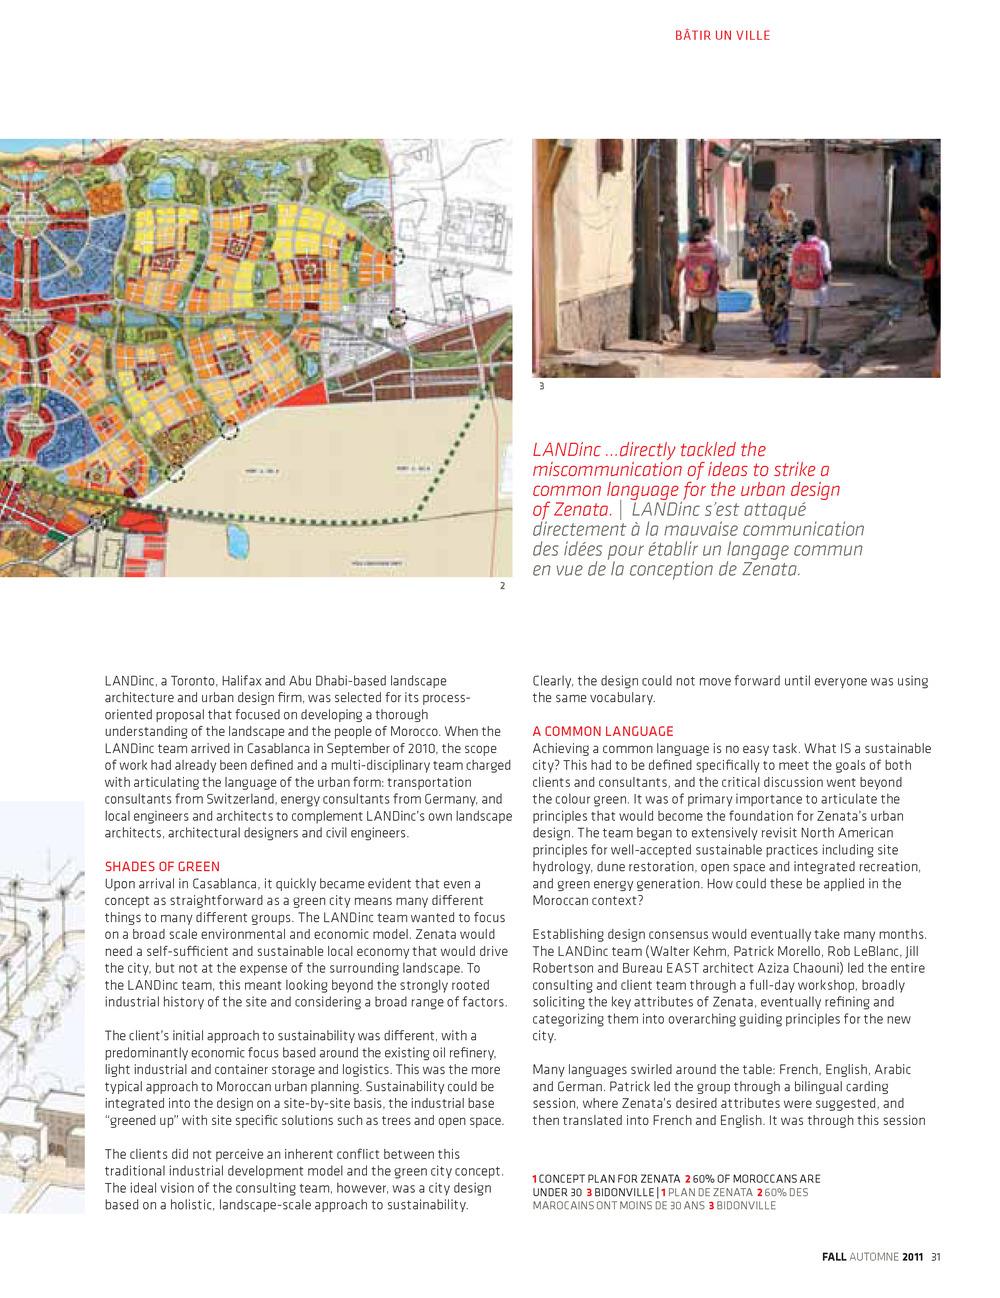 CSLA Zenata article_Page_2.jpg